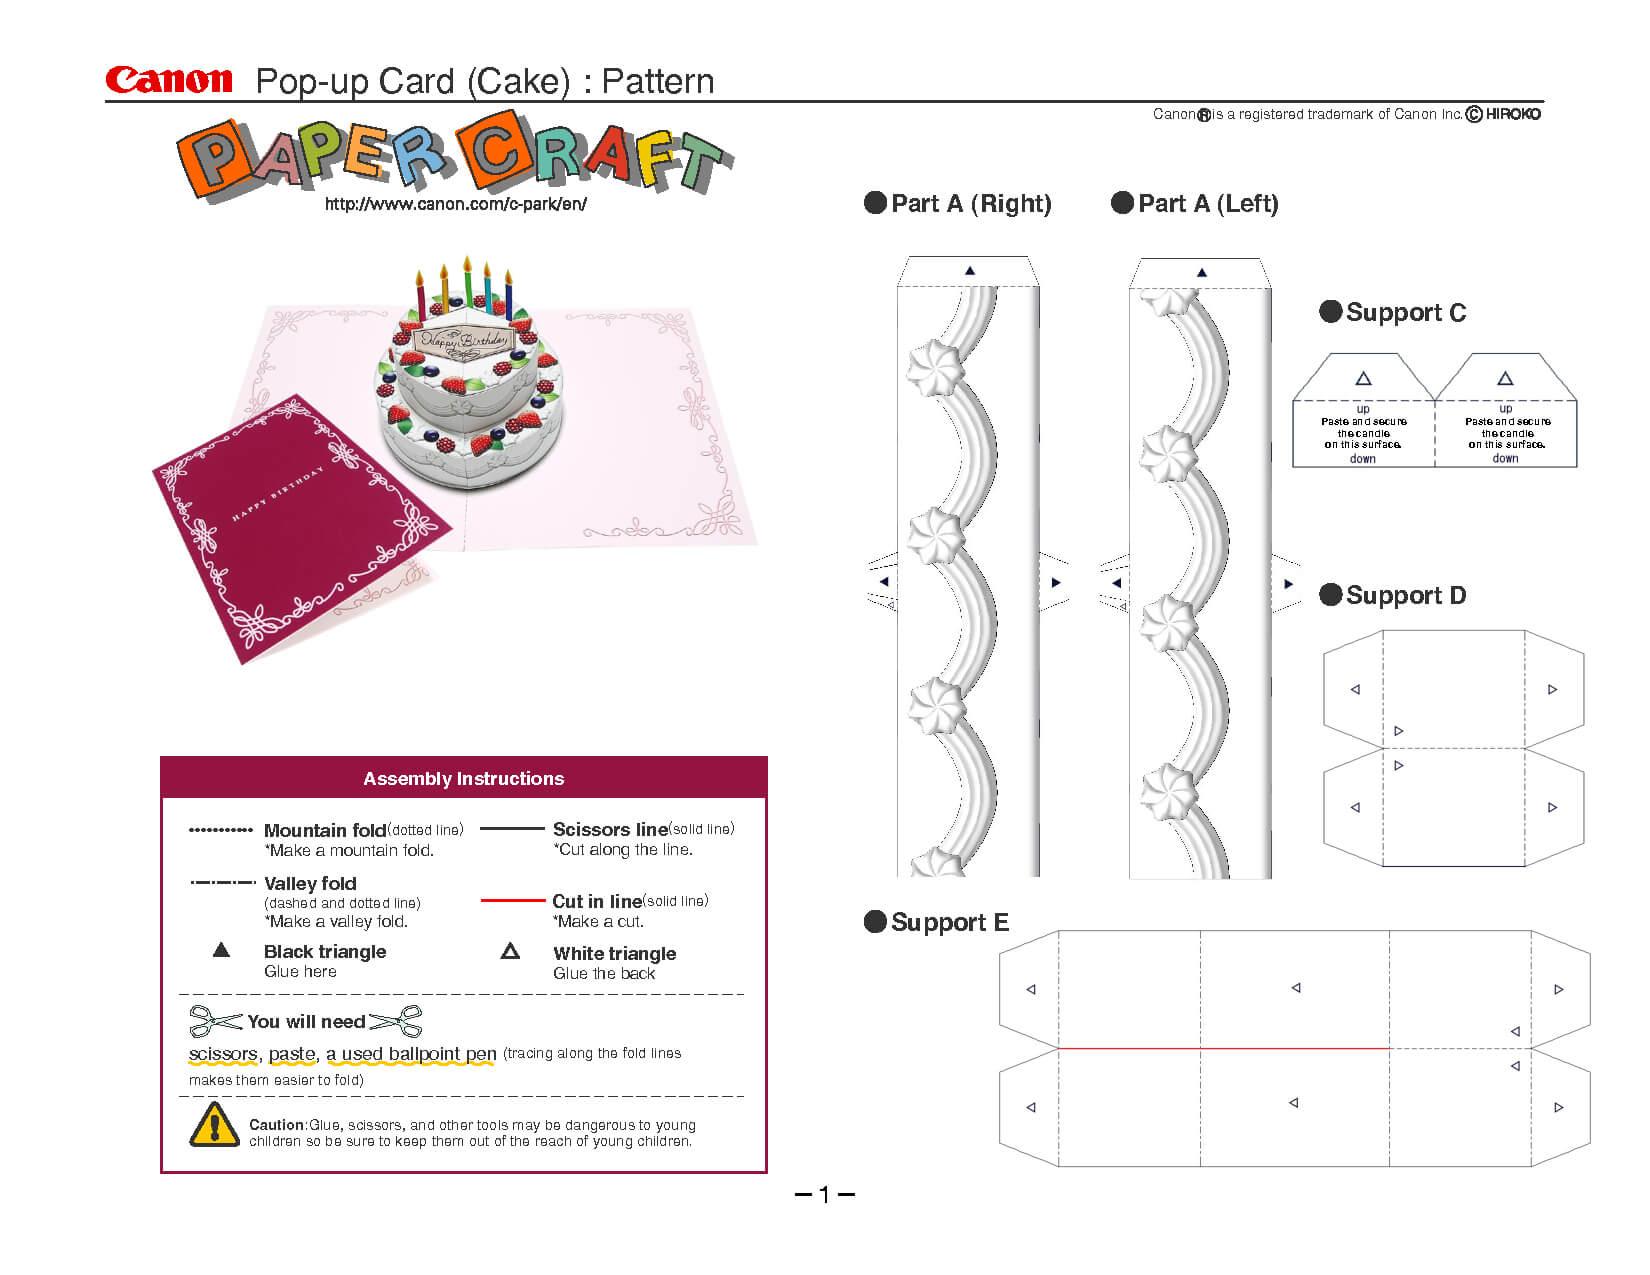 Birthday Cake Pop-Up Card Template   Pop Up Card Templates regarding Templates For Pop Up Cards Free